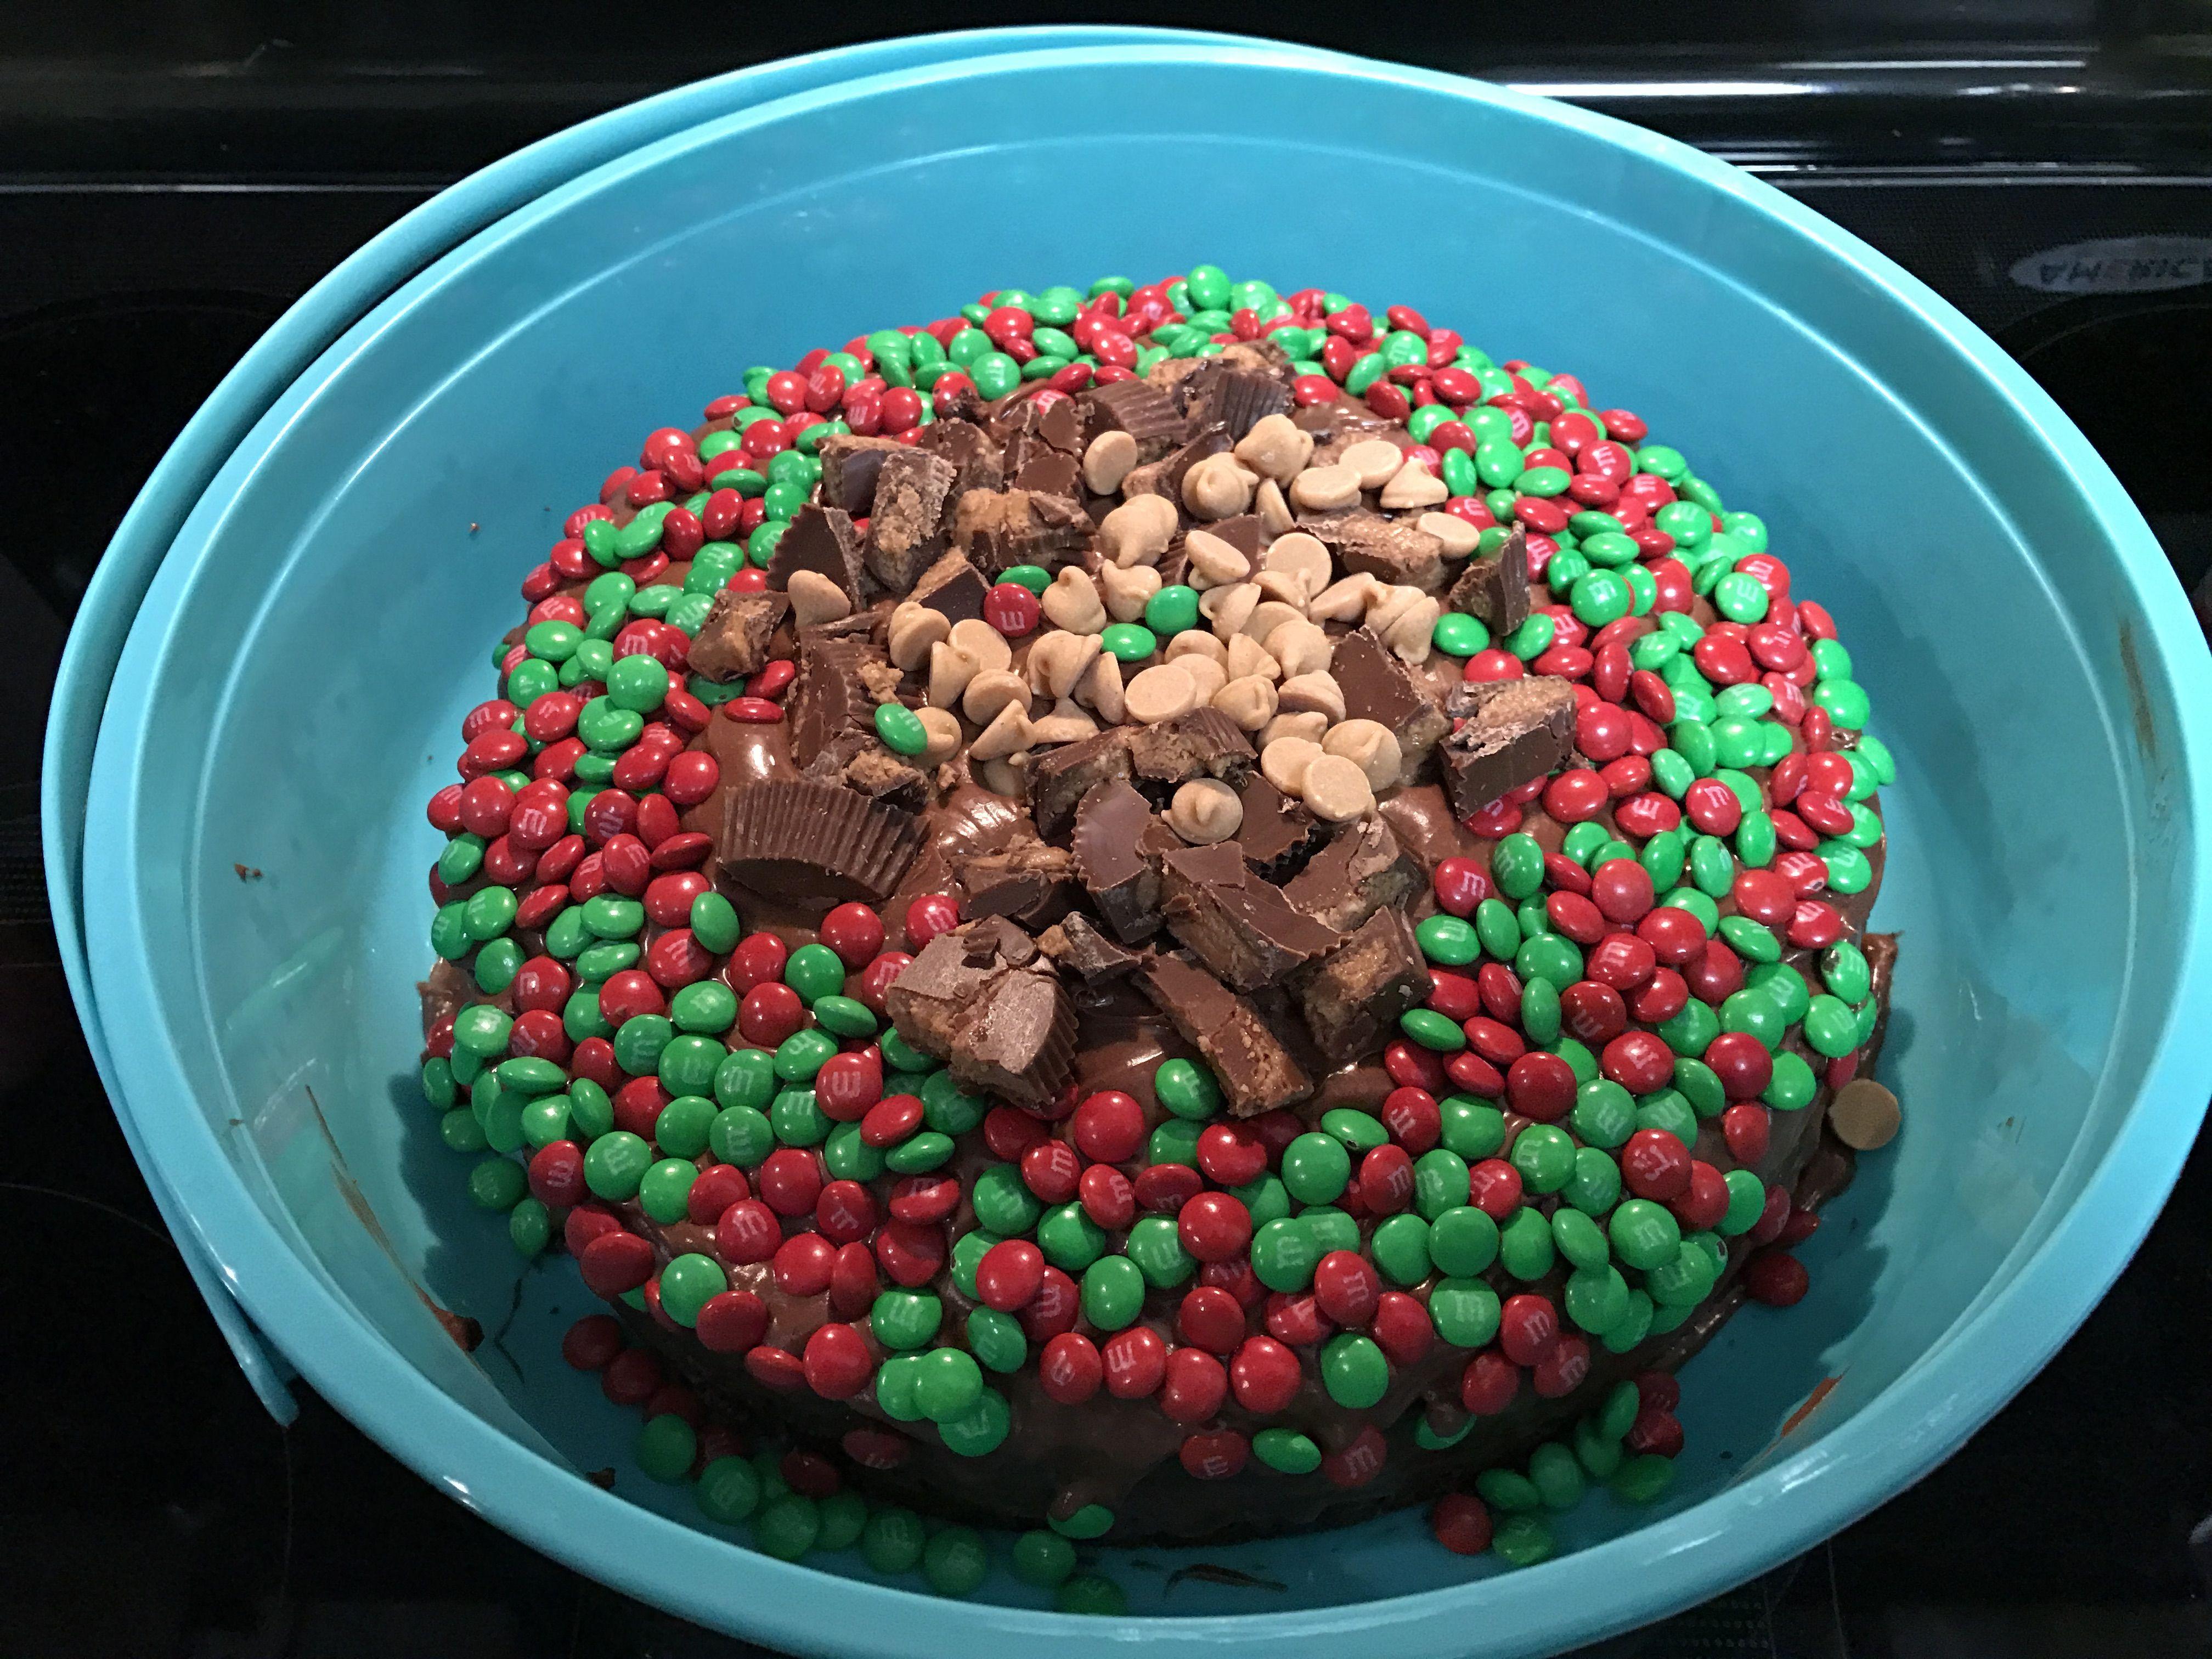 Chocolate, m&m's, & Reese's cake.